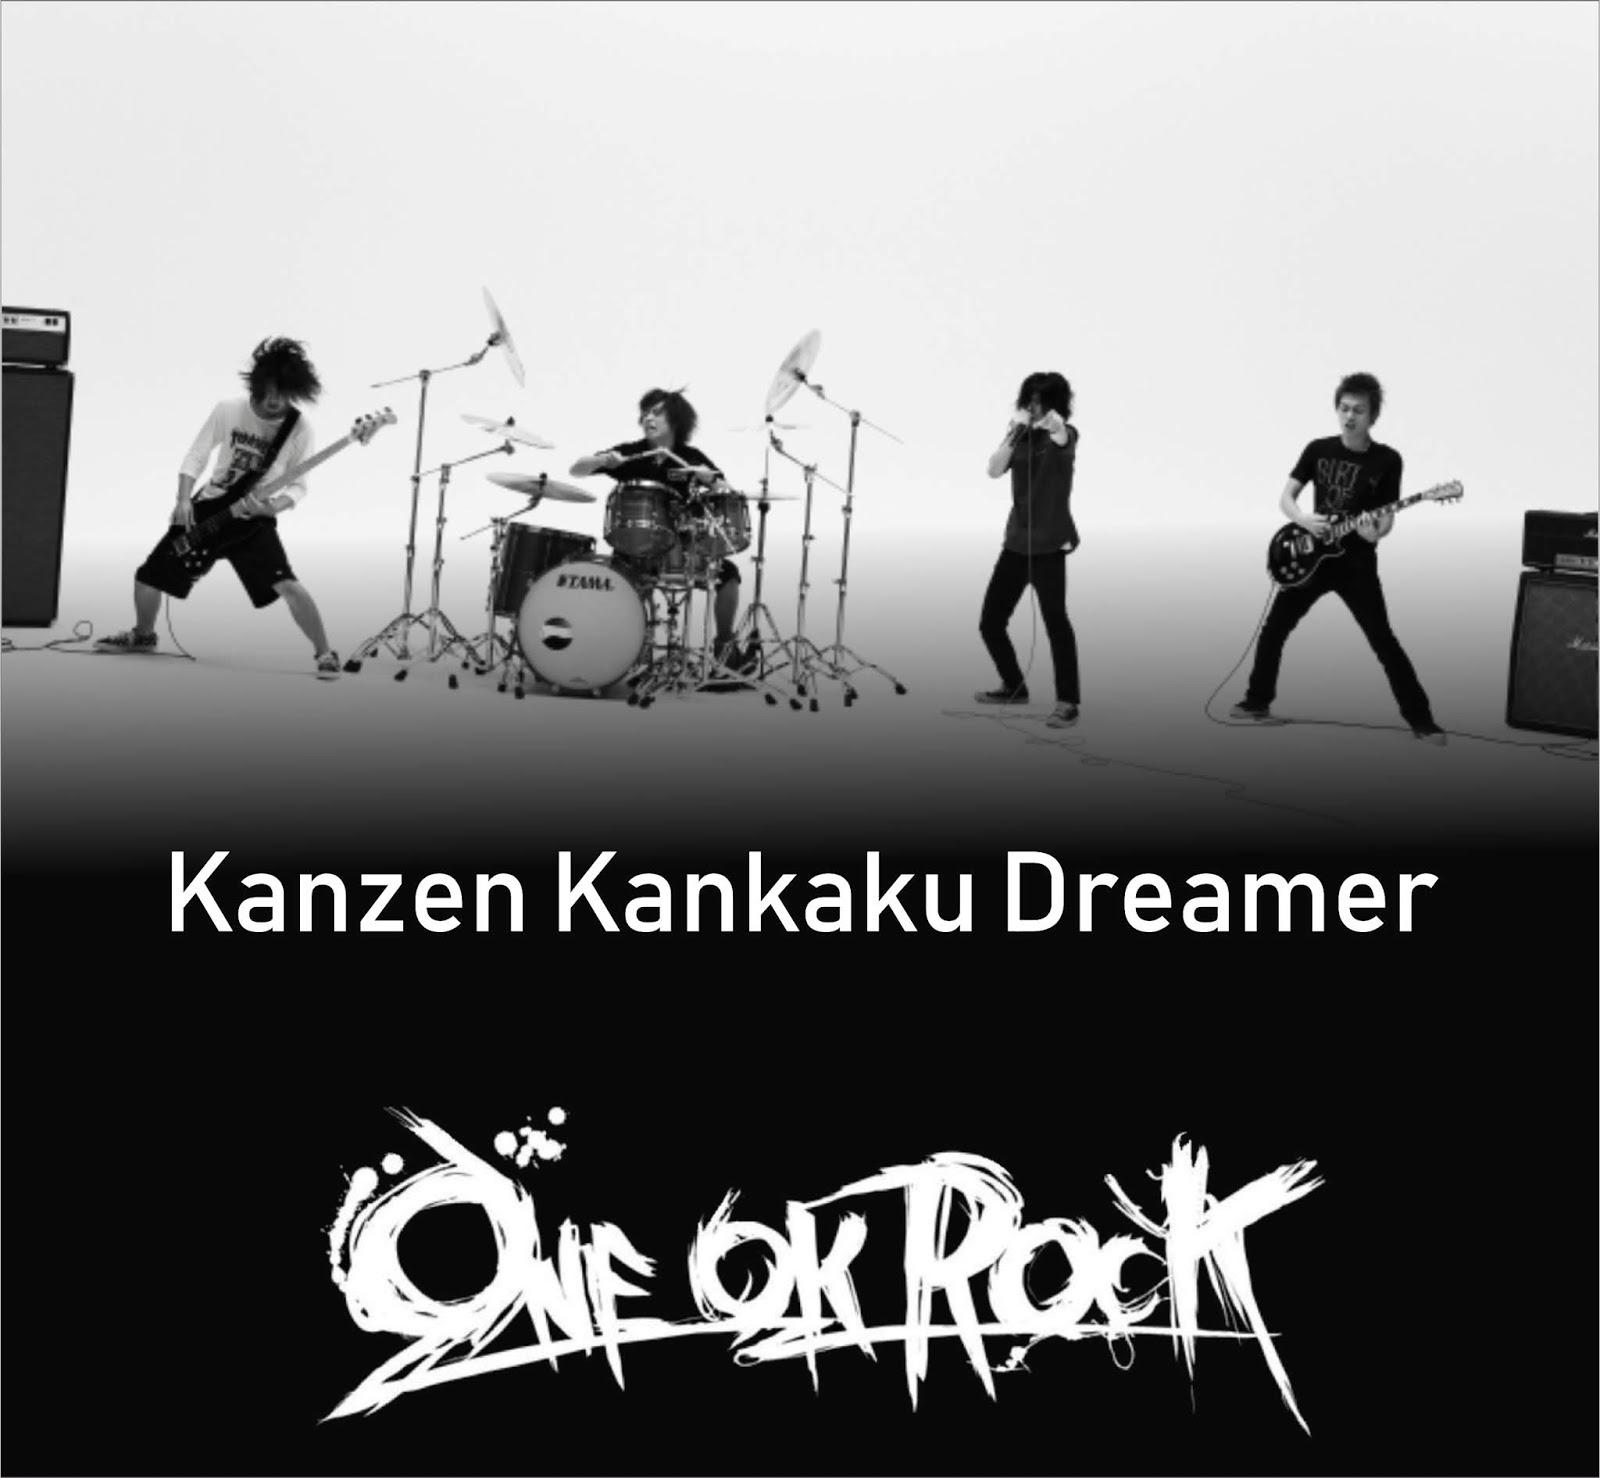 One Ok Rock - Kanzen Kankaku Dreamer (Lyrics + Chord